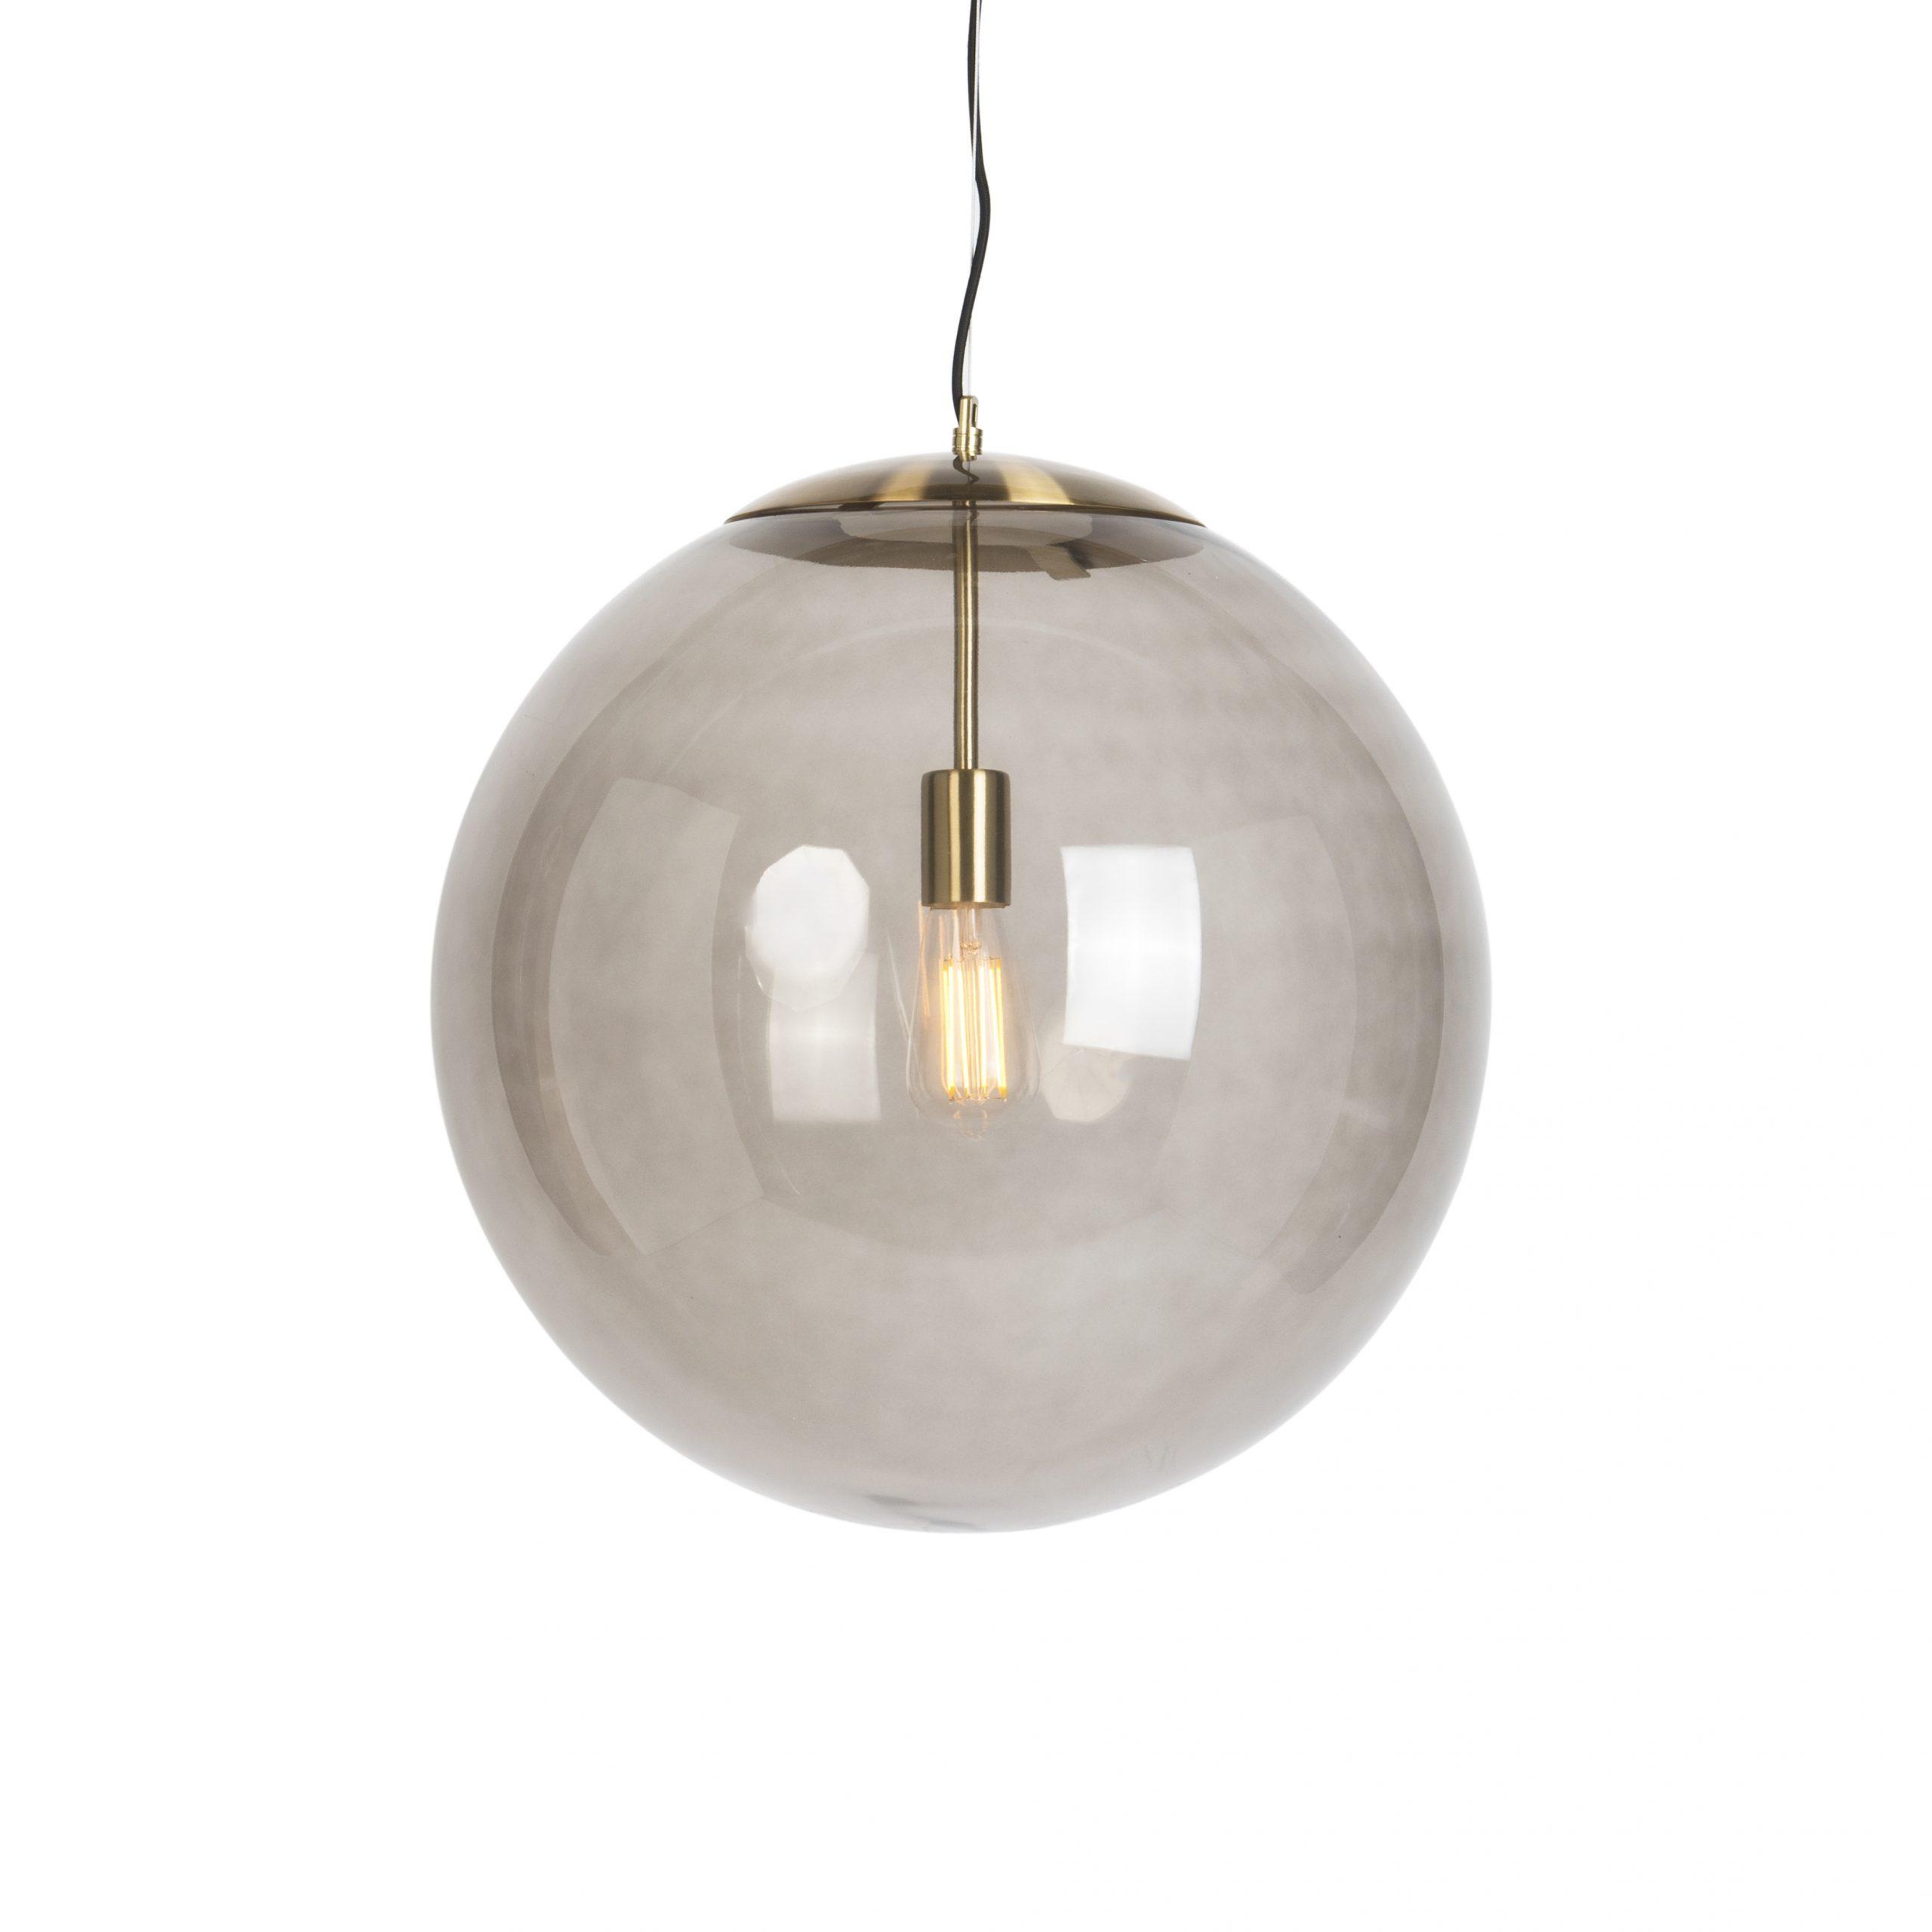 Hanglamp Ball 50 messing met smoke glas | QAZQA | 8718881068010